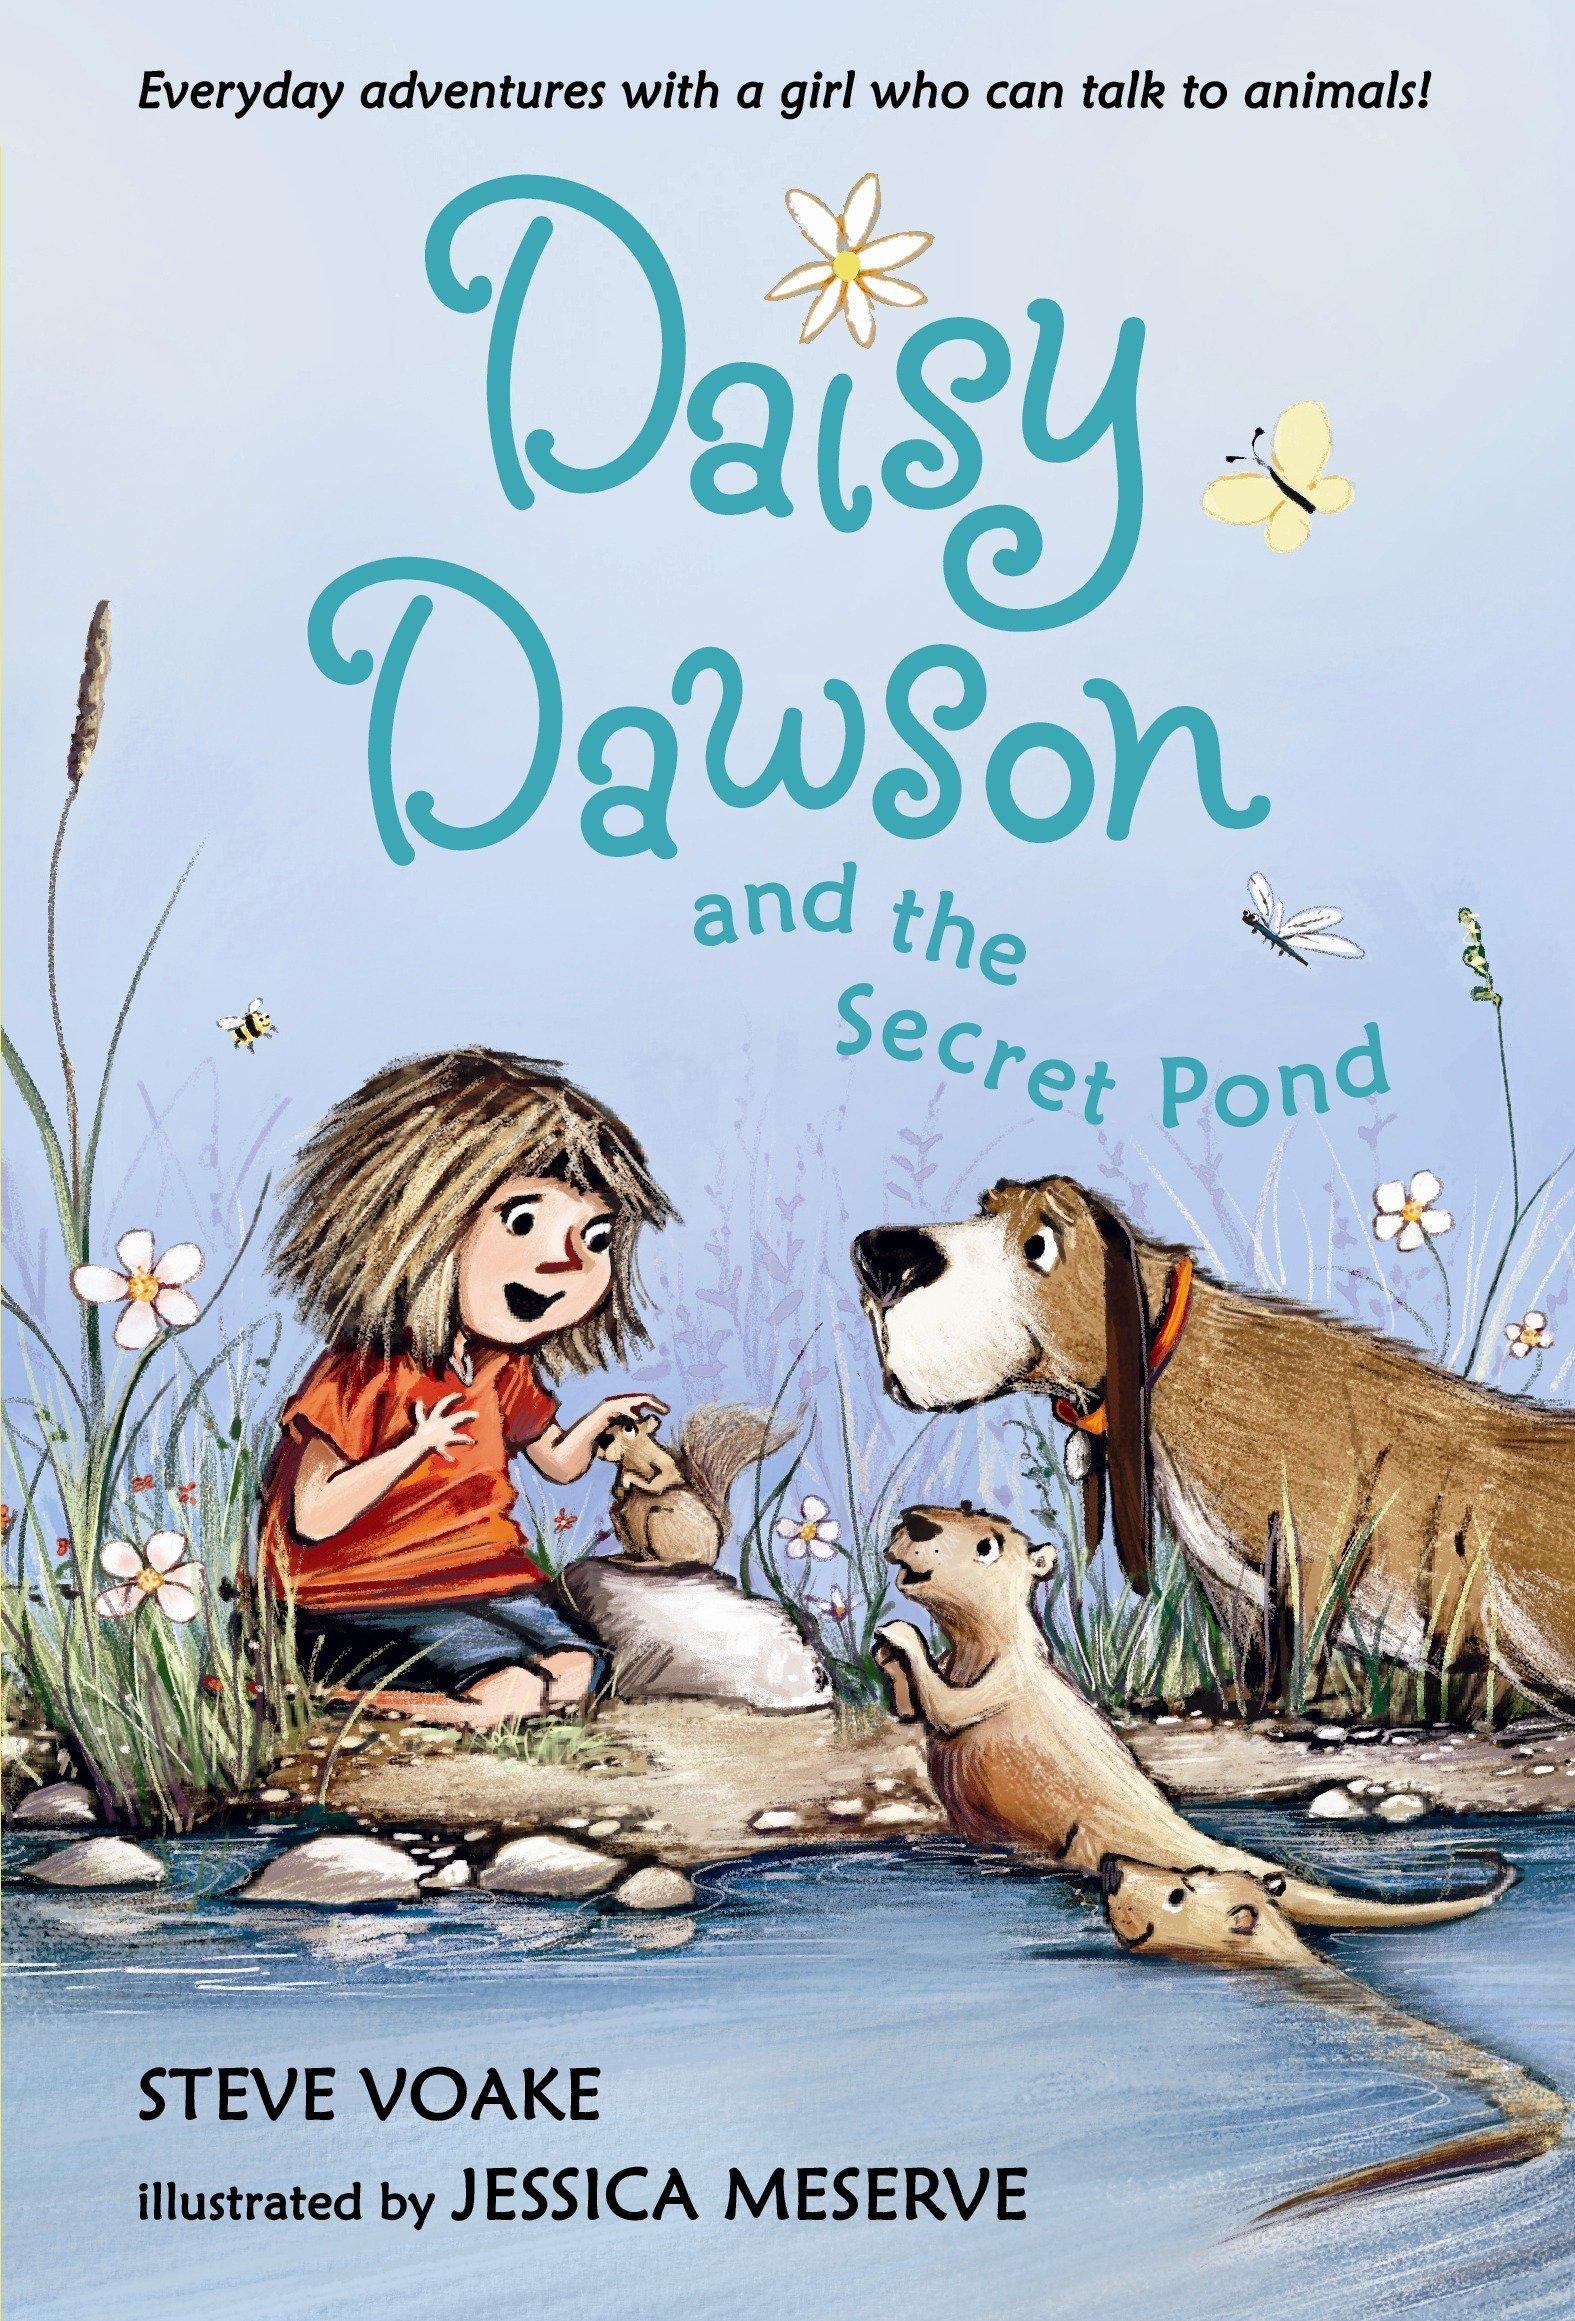 Amazon.com: Daisy Dawson and the Secret Pond (9780763647308): Steve Voake,  Jessica Meserve: Books